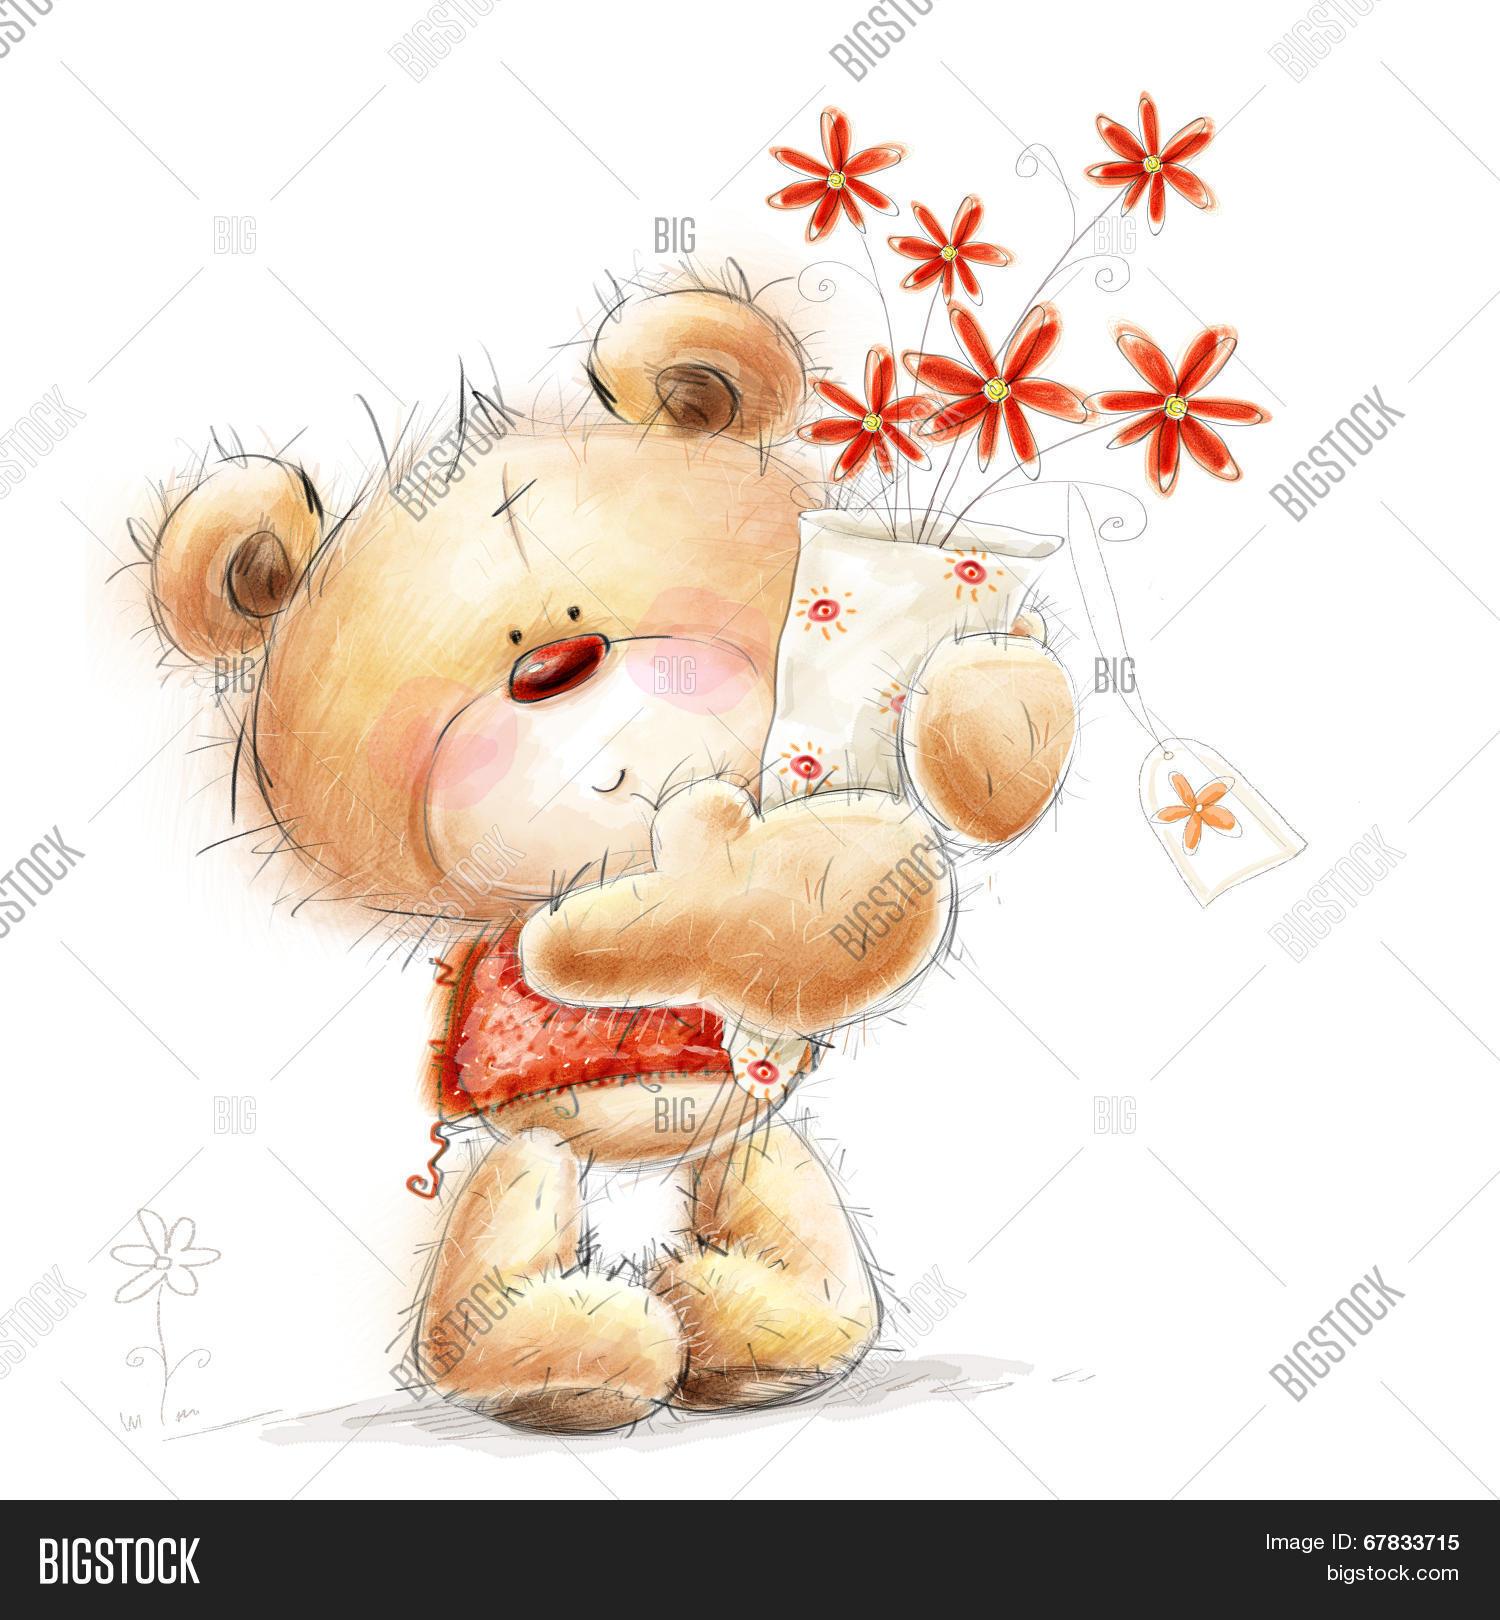 Cute Teddy Bear Red Image Photo Free Trial Bigstock